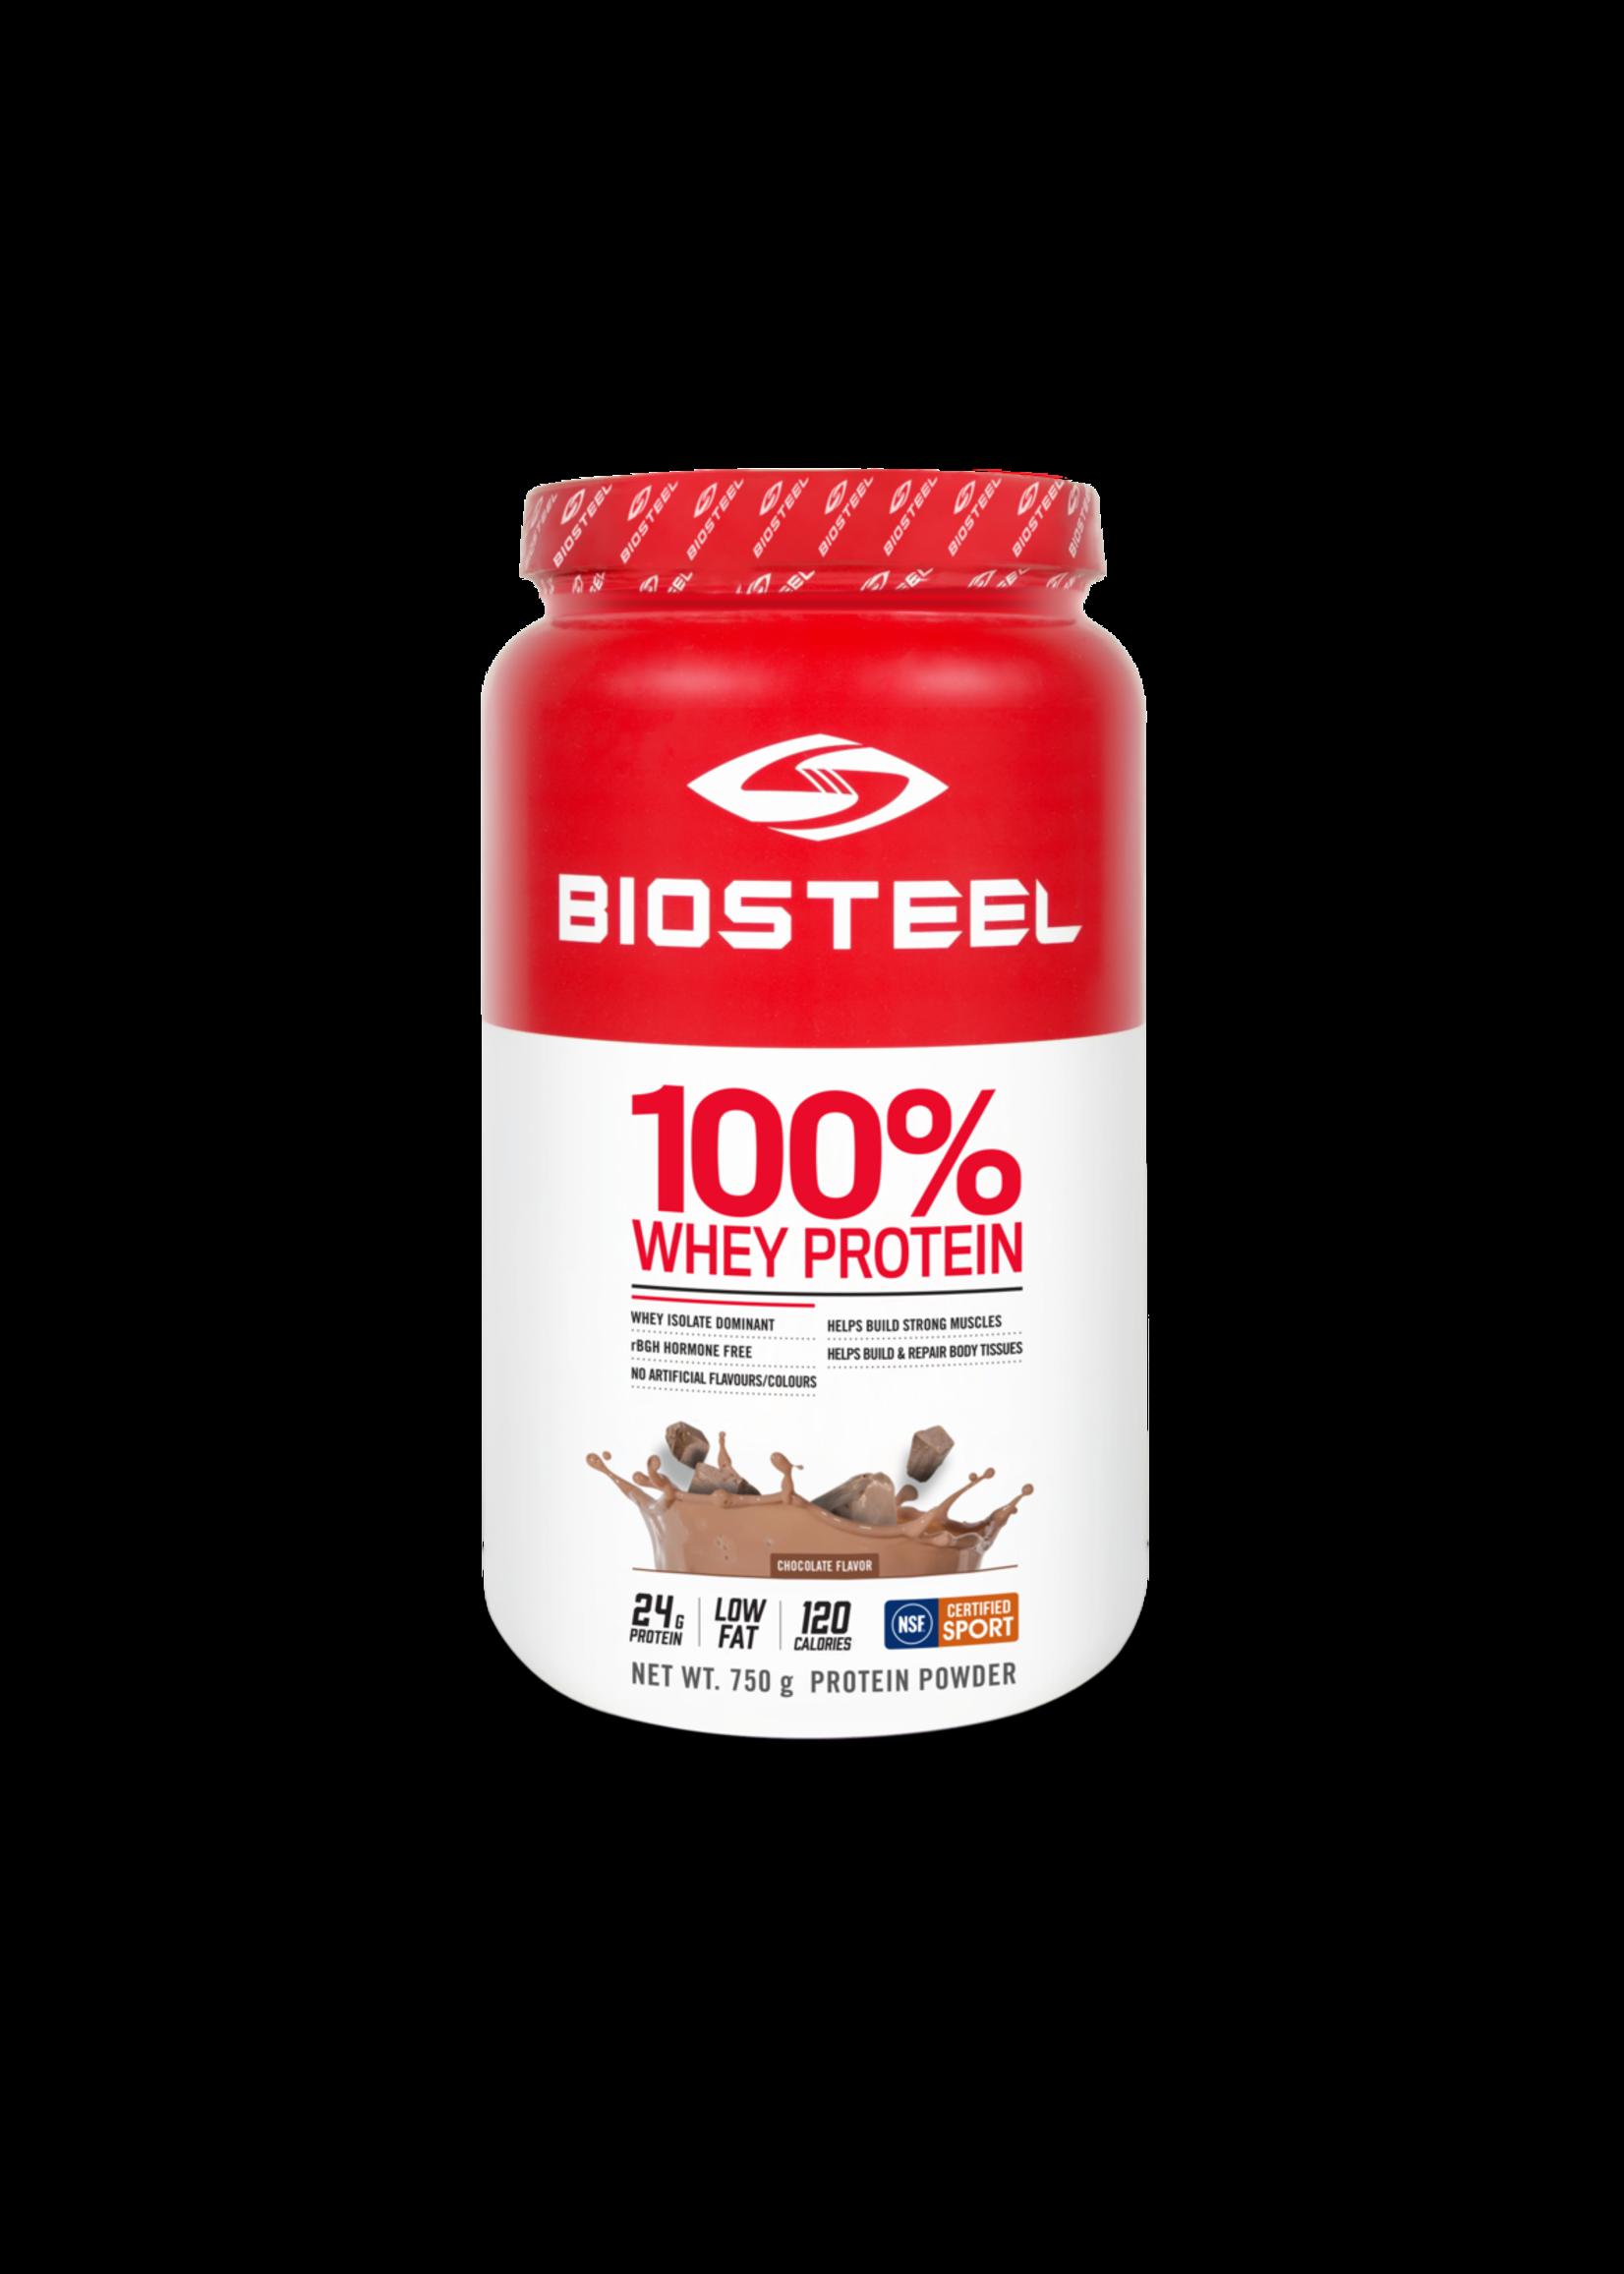 BIOSTEEL CHOCOLATE 750G 100% WHEY PROTEIN